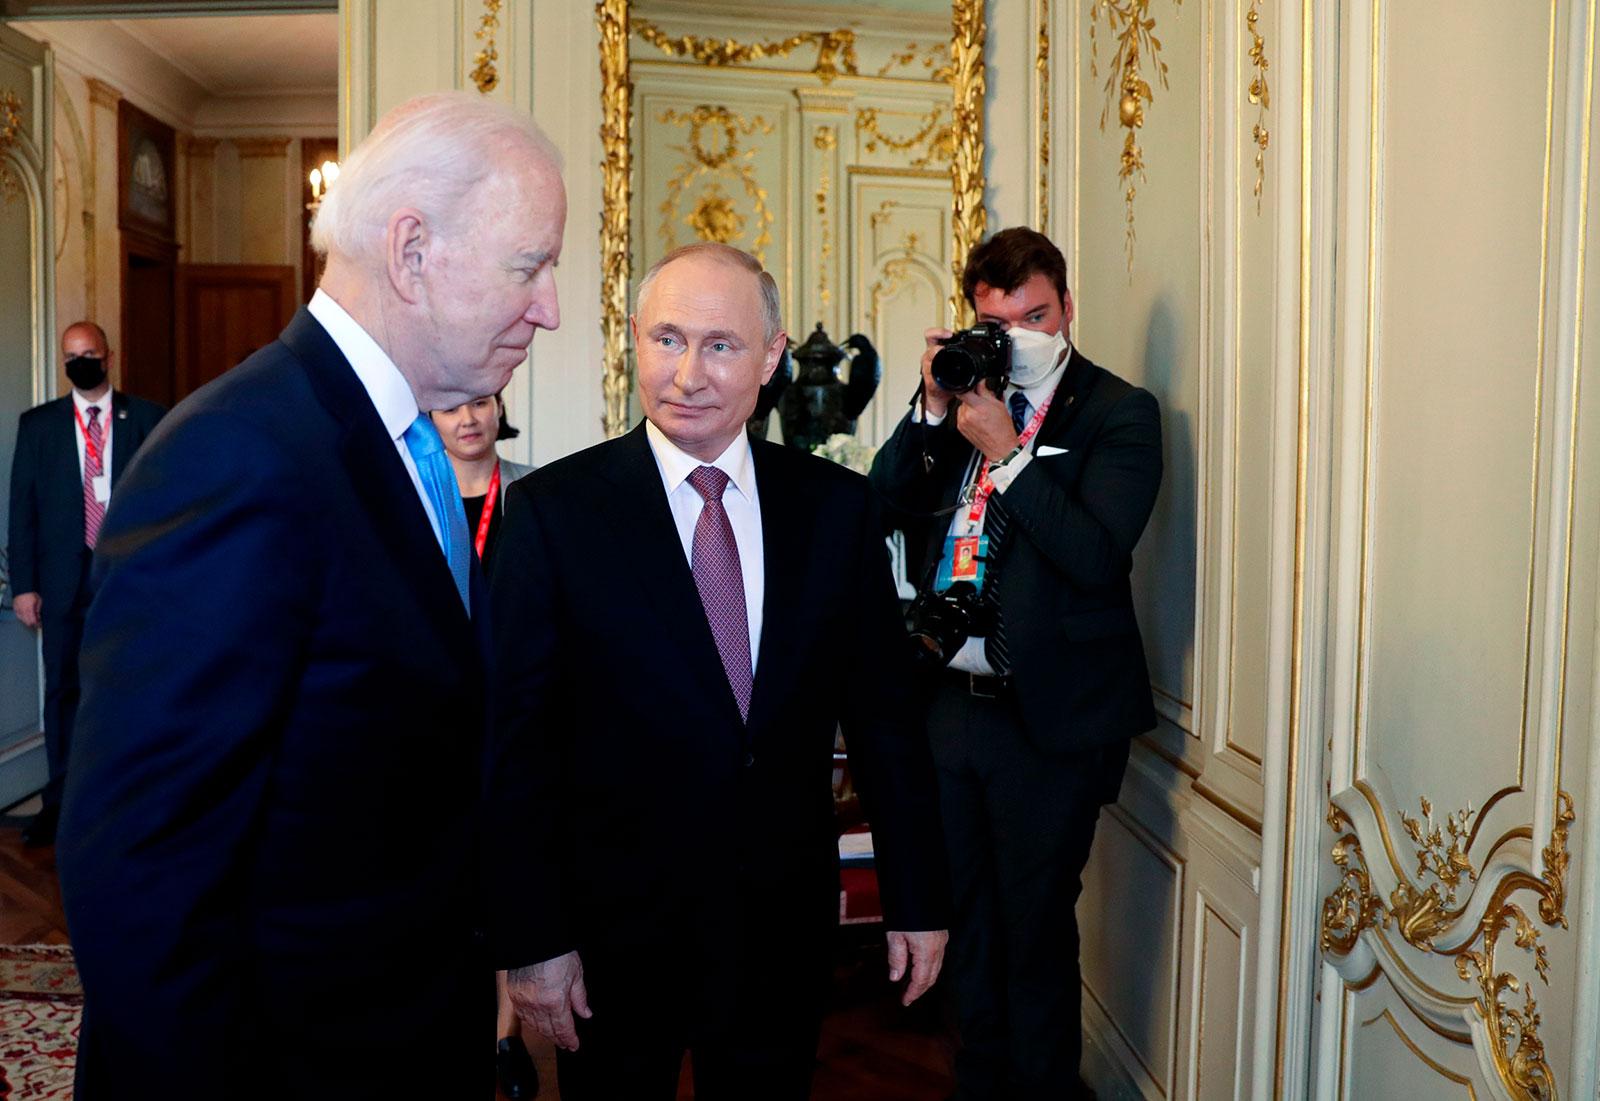 US President Joe Biden and Russian President Vladimir Putin walk in a hall during their meeting at the Villa la Grange in Geneva.